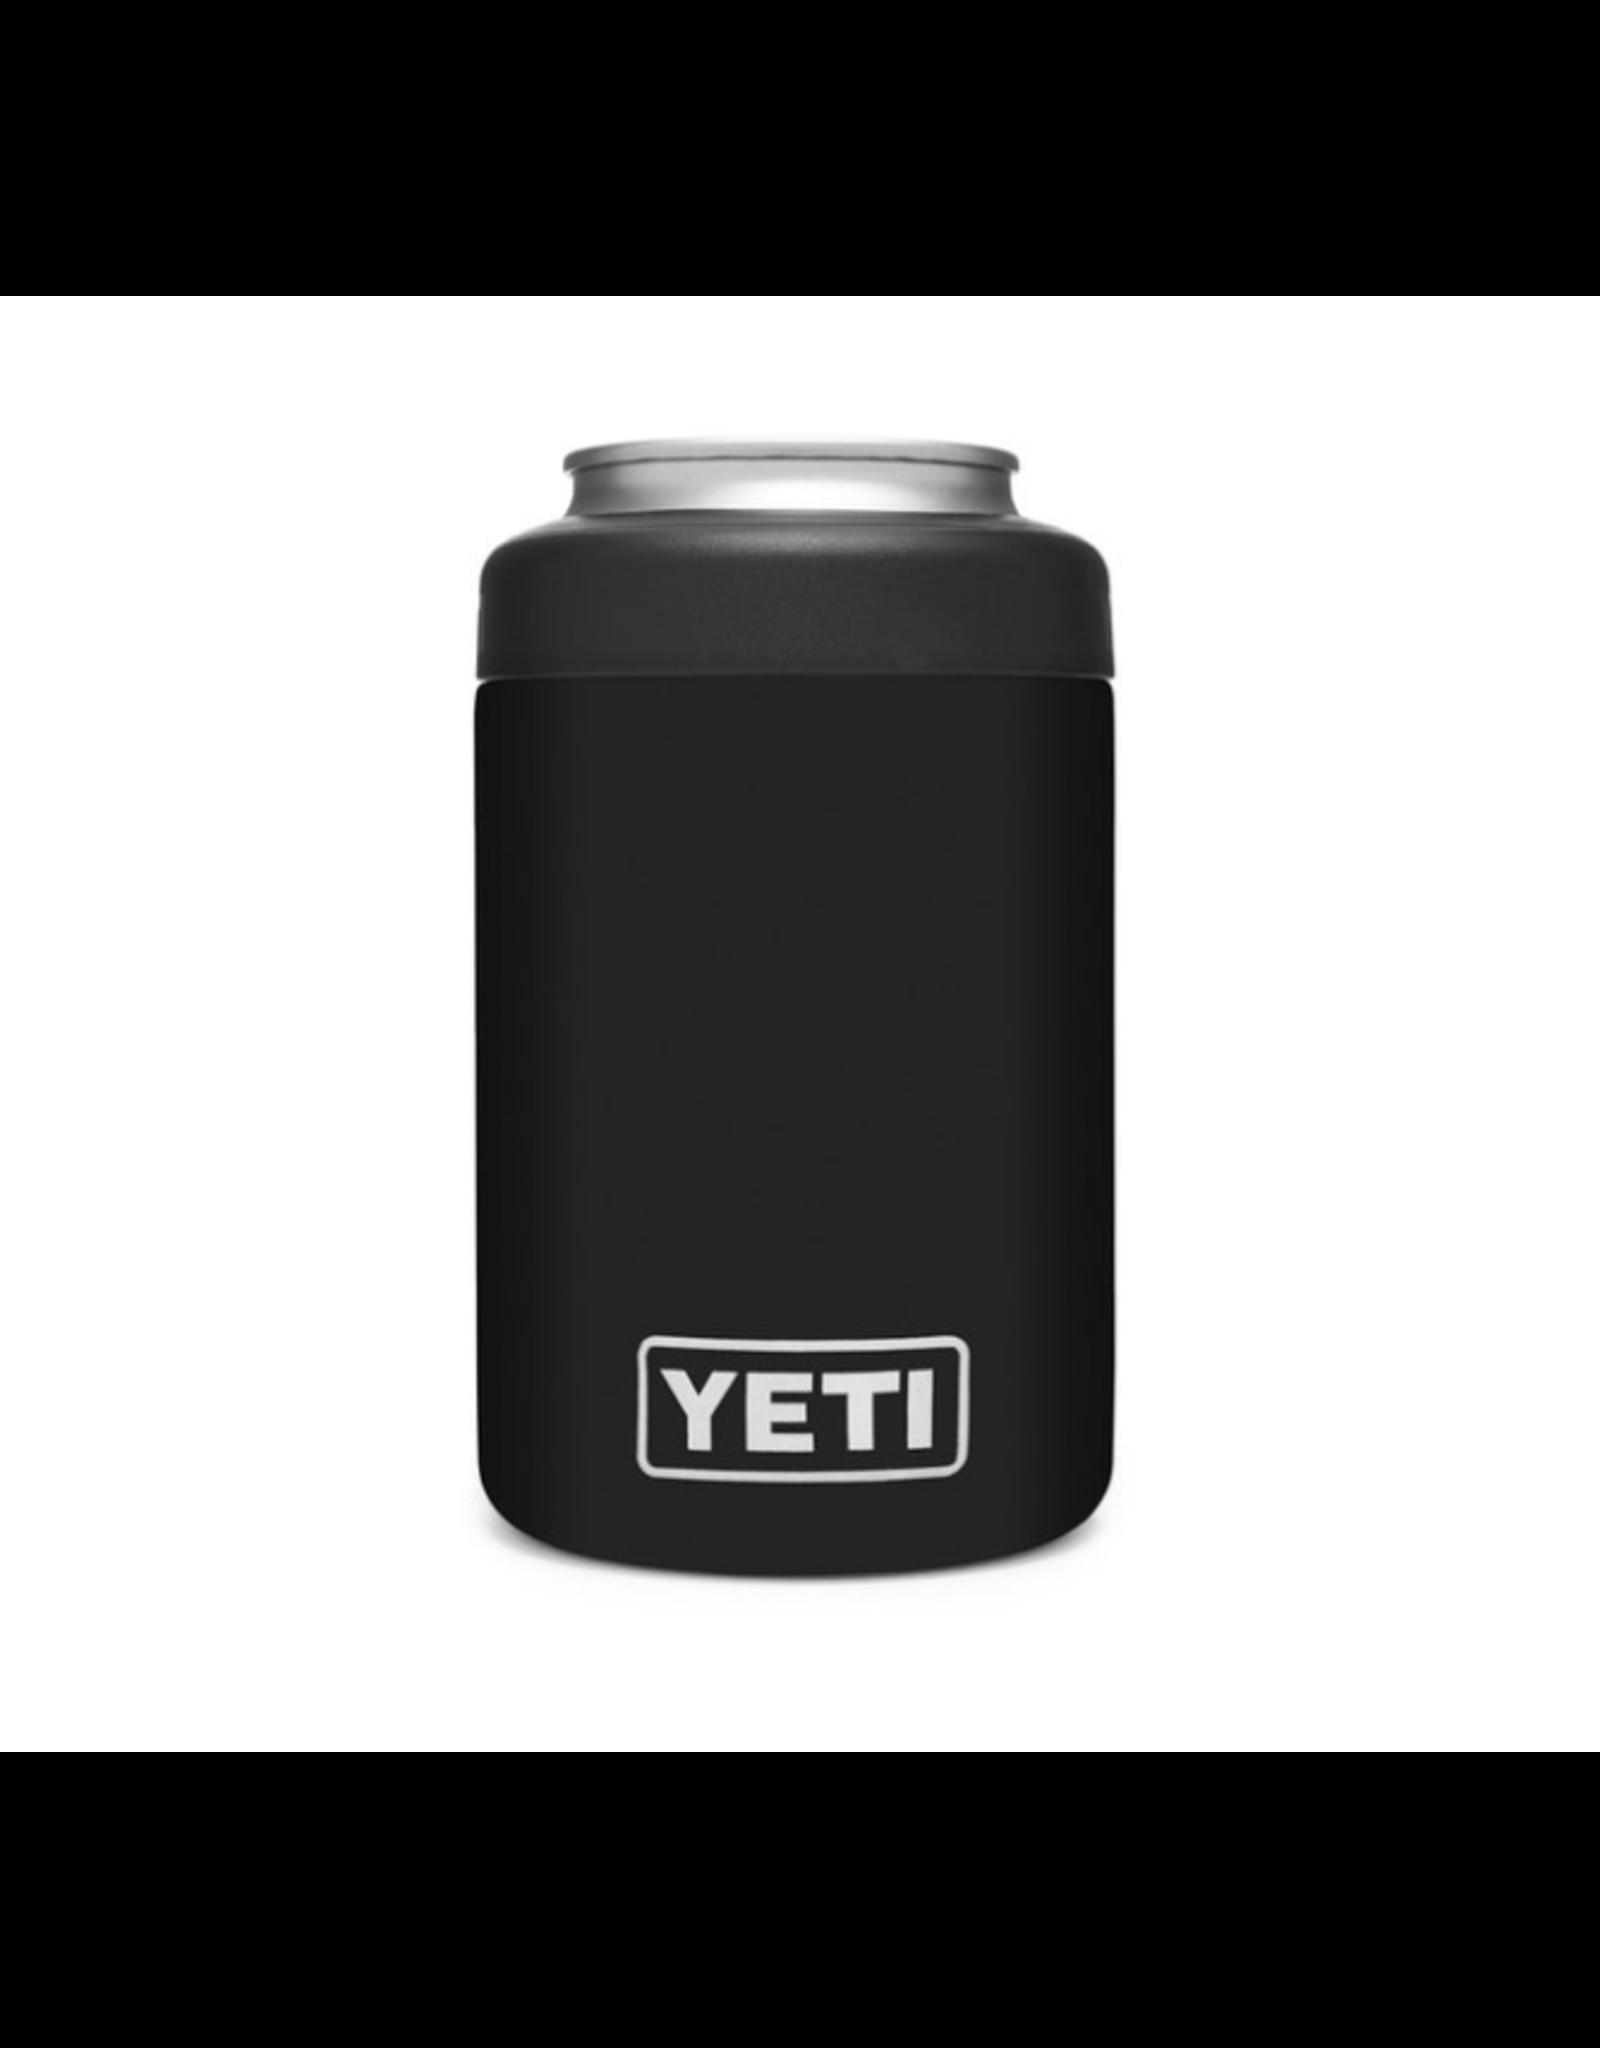 Yeti Rambler Colster 2.0 Black